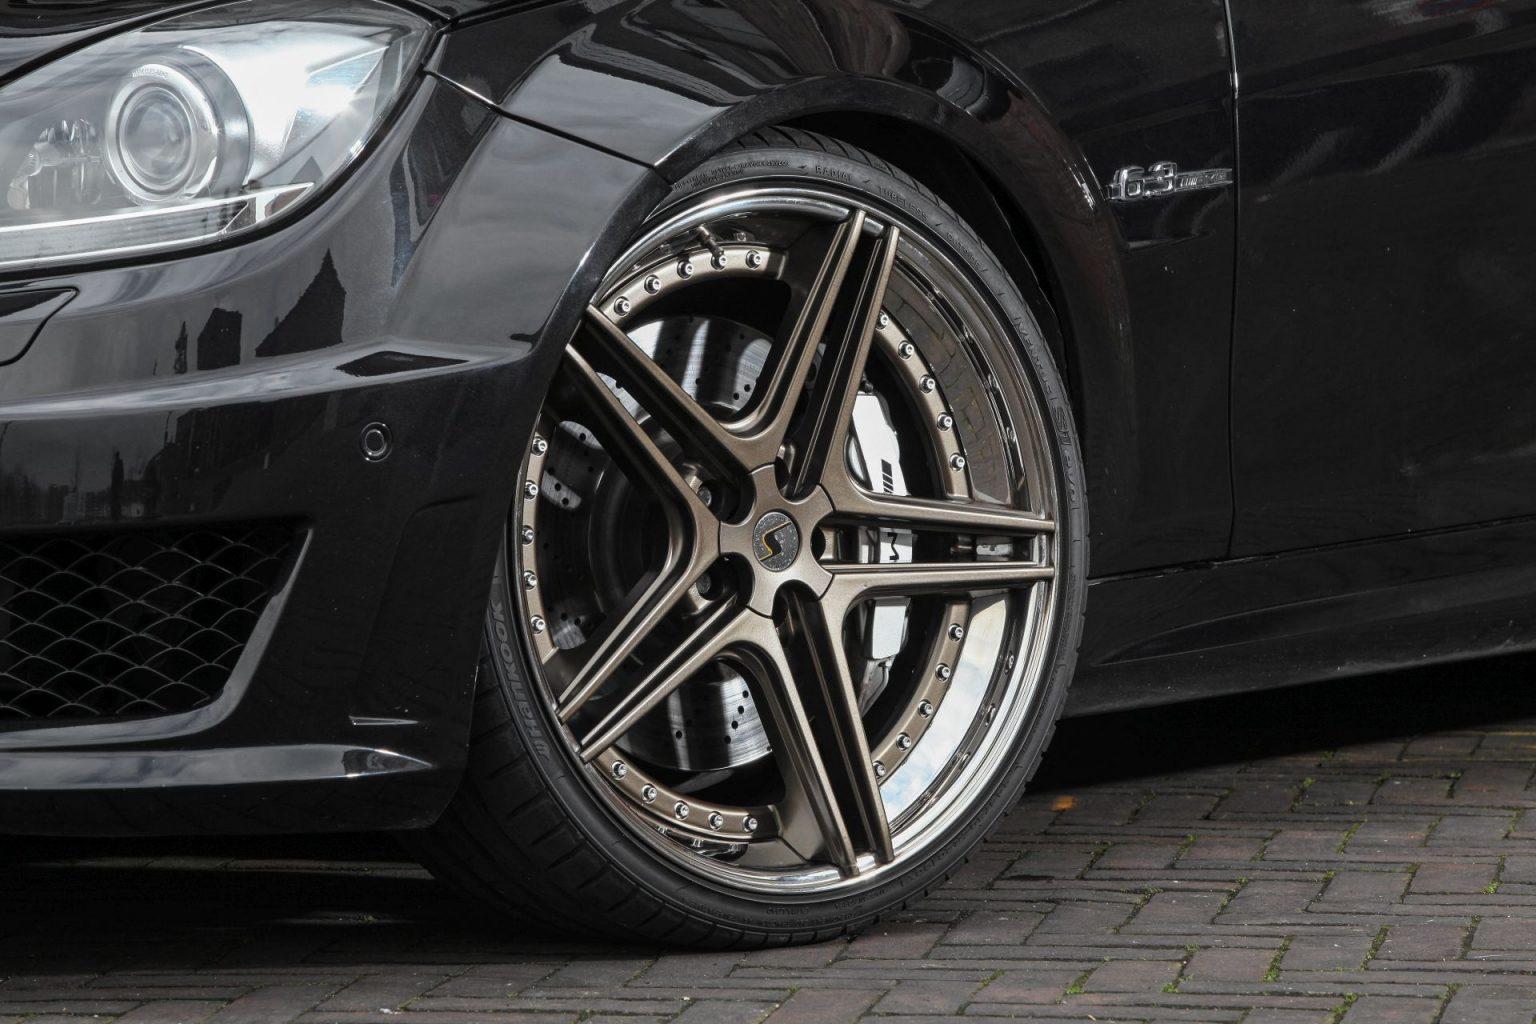 All Types amg black series wheels : Mercedes C63 AMG wheels by Raceland #FSLine - Schmidt Wheels